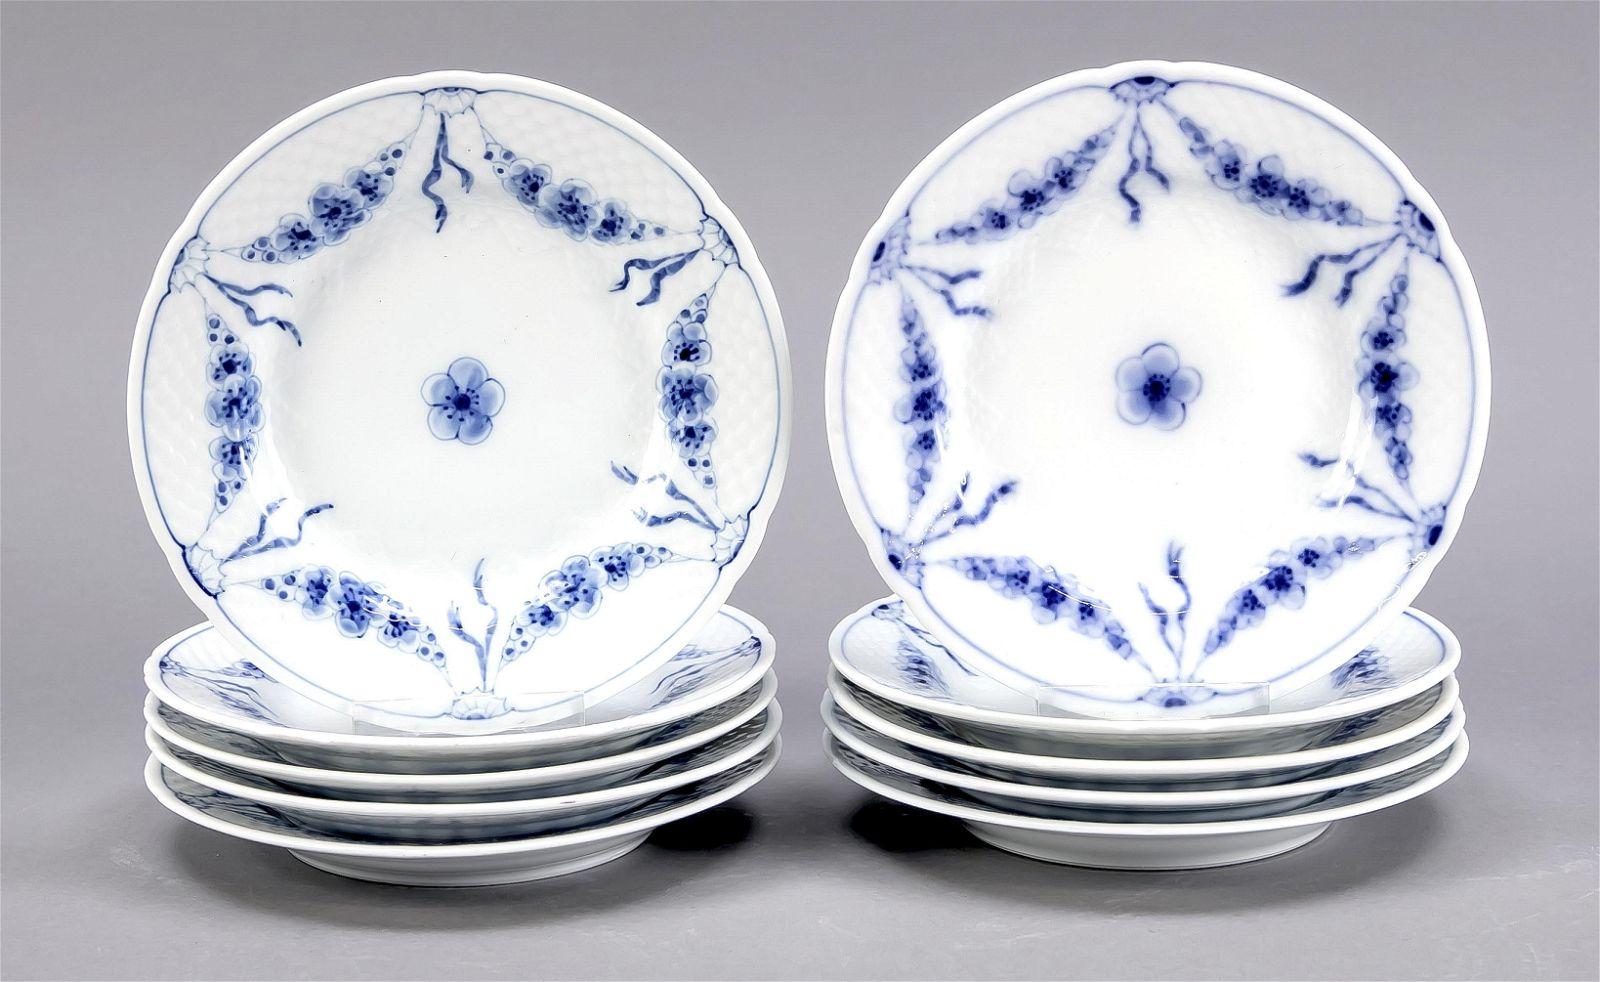 Ten bread plates, Bing & Gröndahl, C